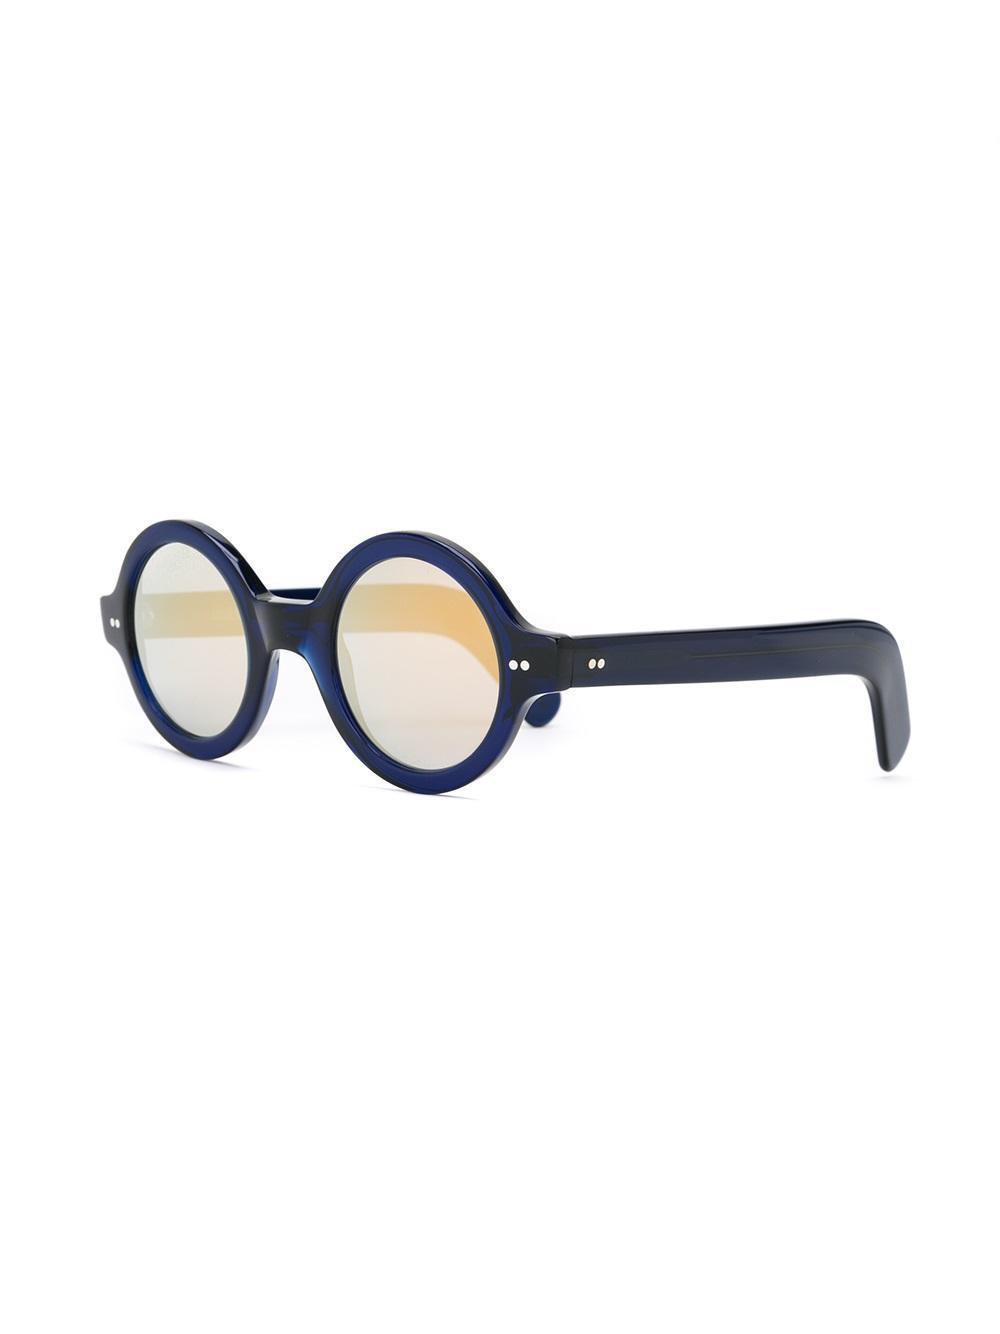 Cutler & Gross Round Framed Sunglasses in Blue